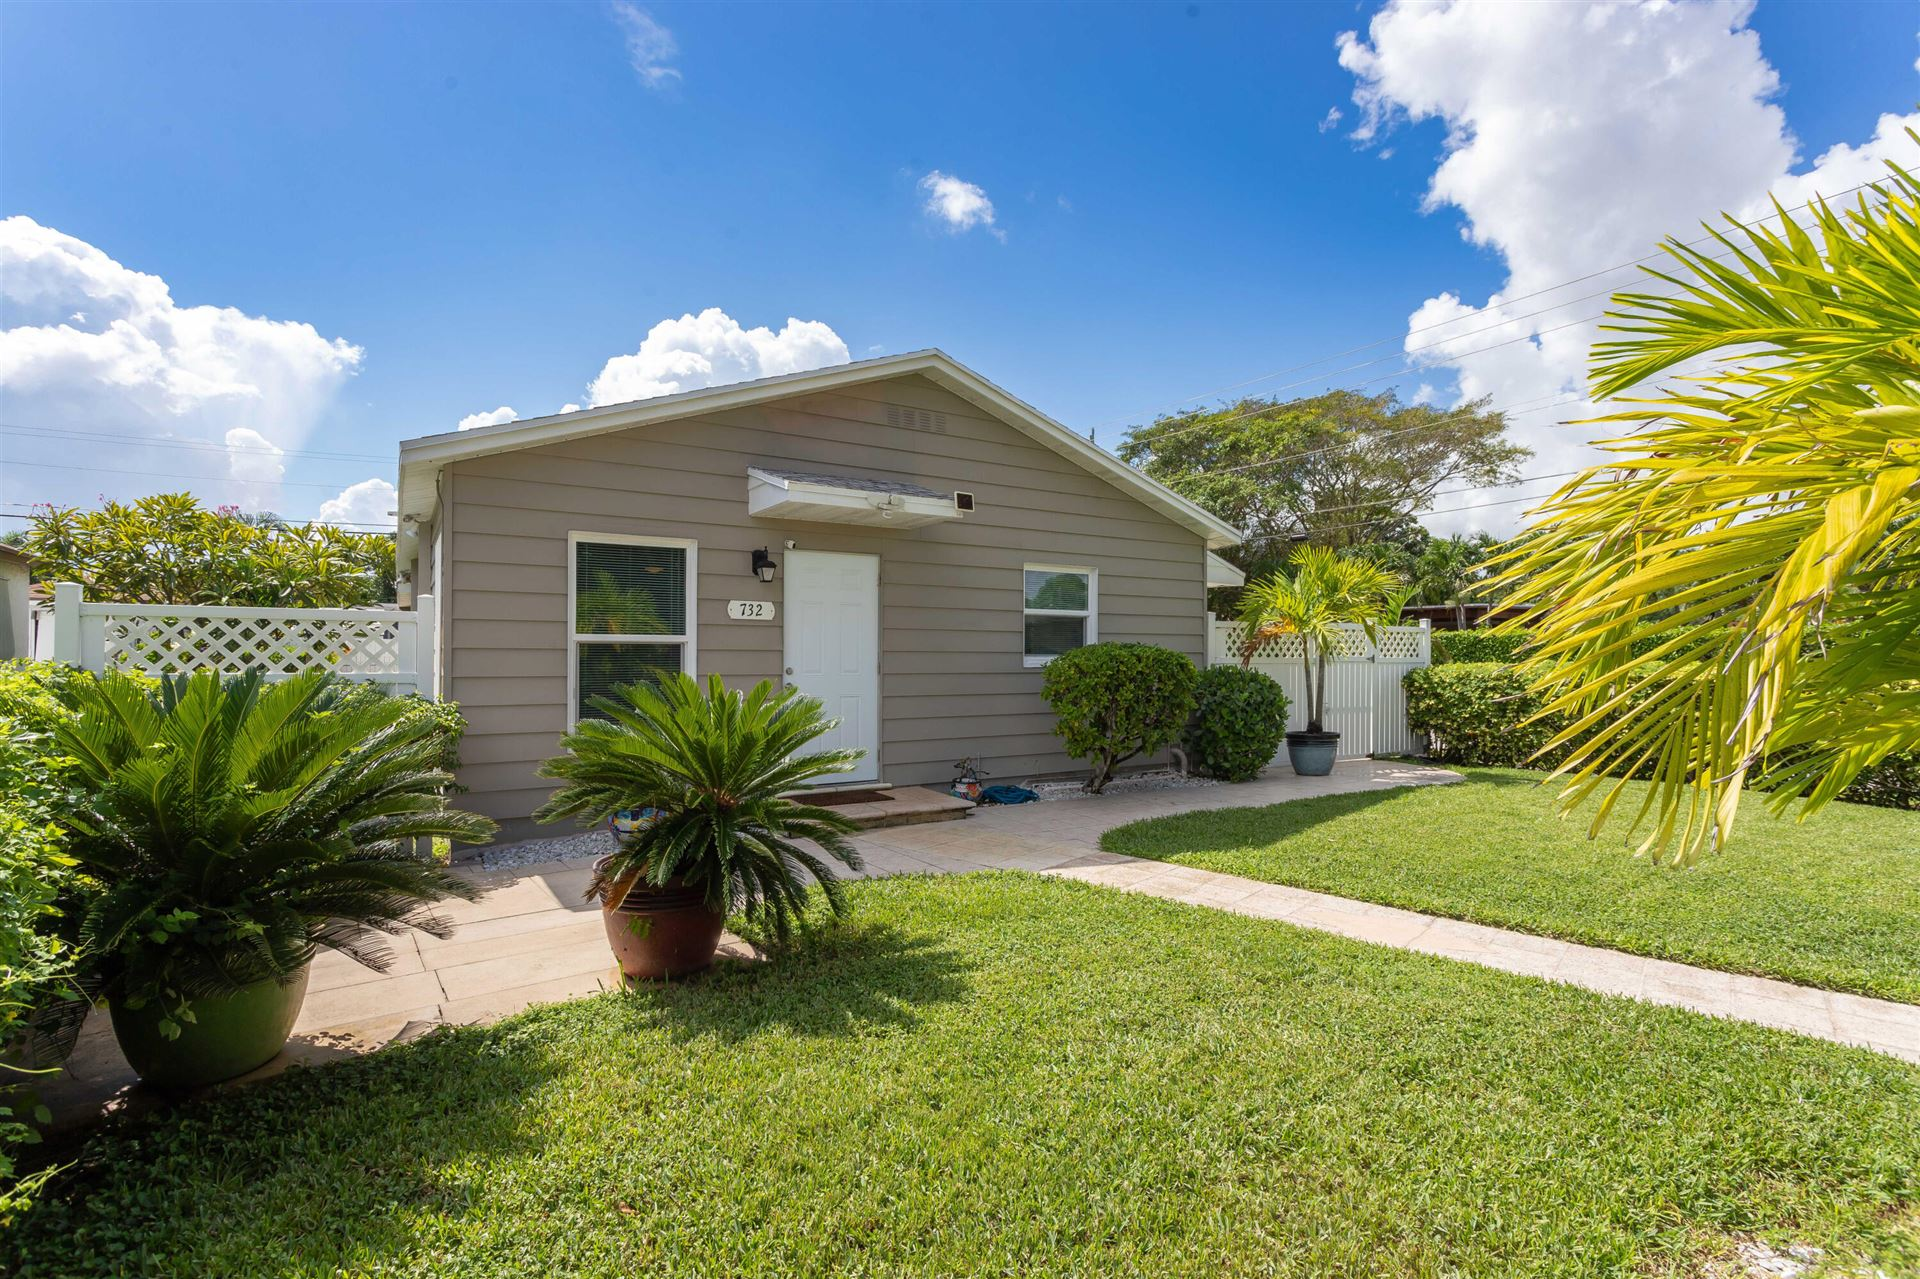 732 Mcintosh Street, West Palm Beach, FL 33405 - MLS#: RX-10751740